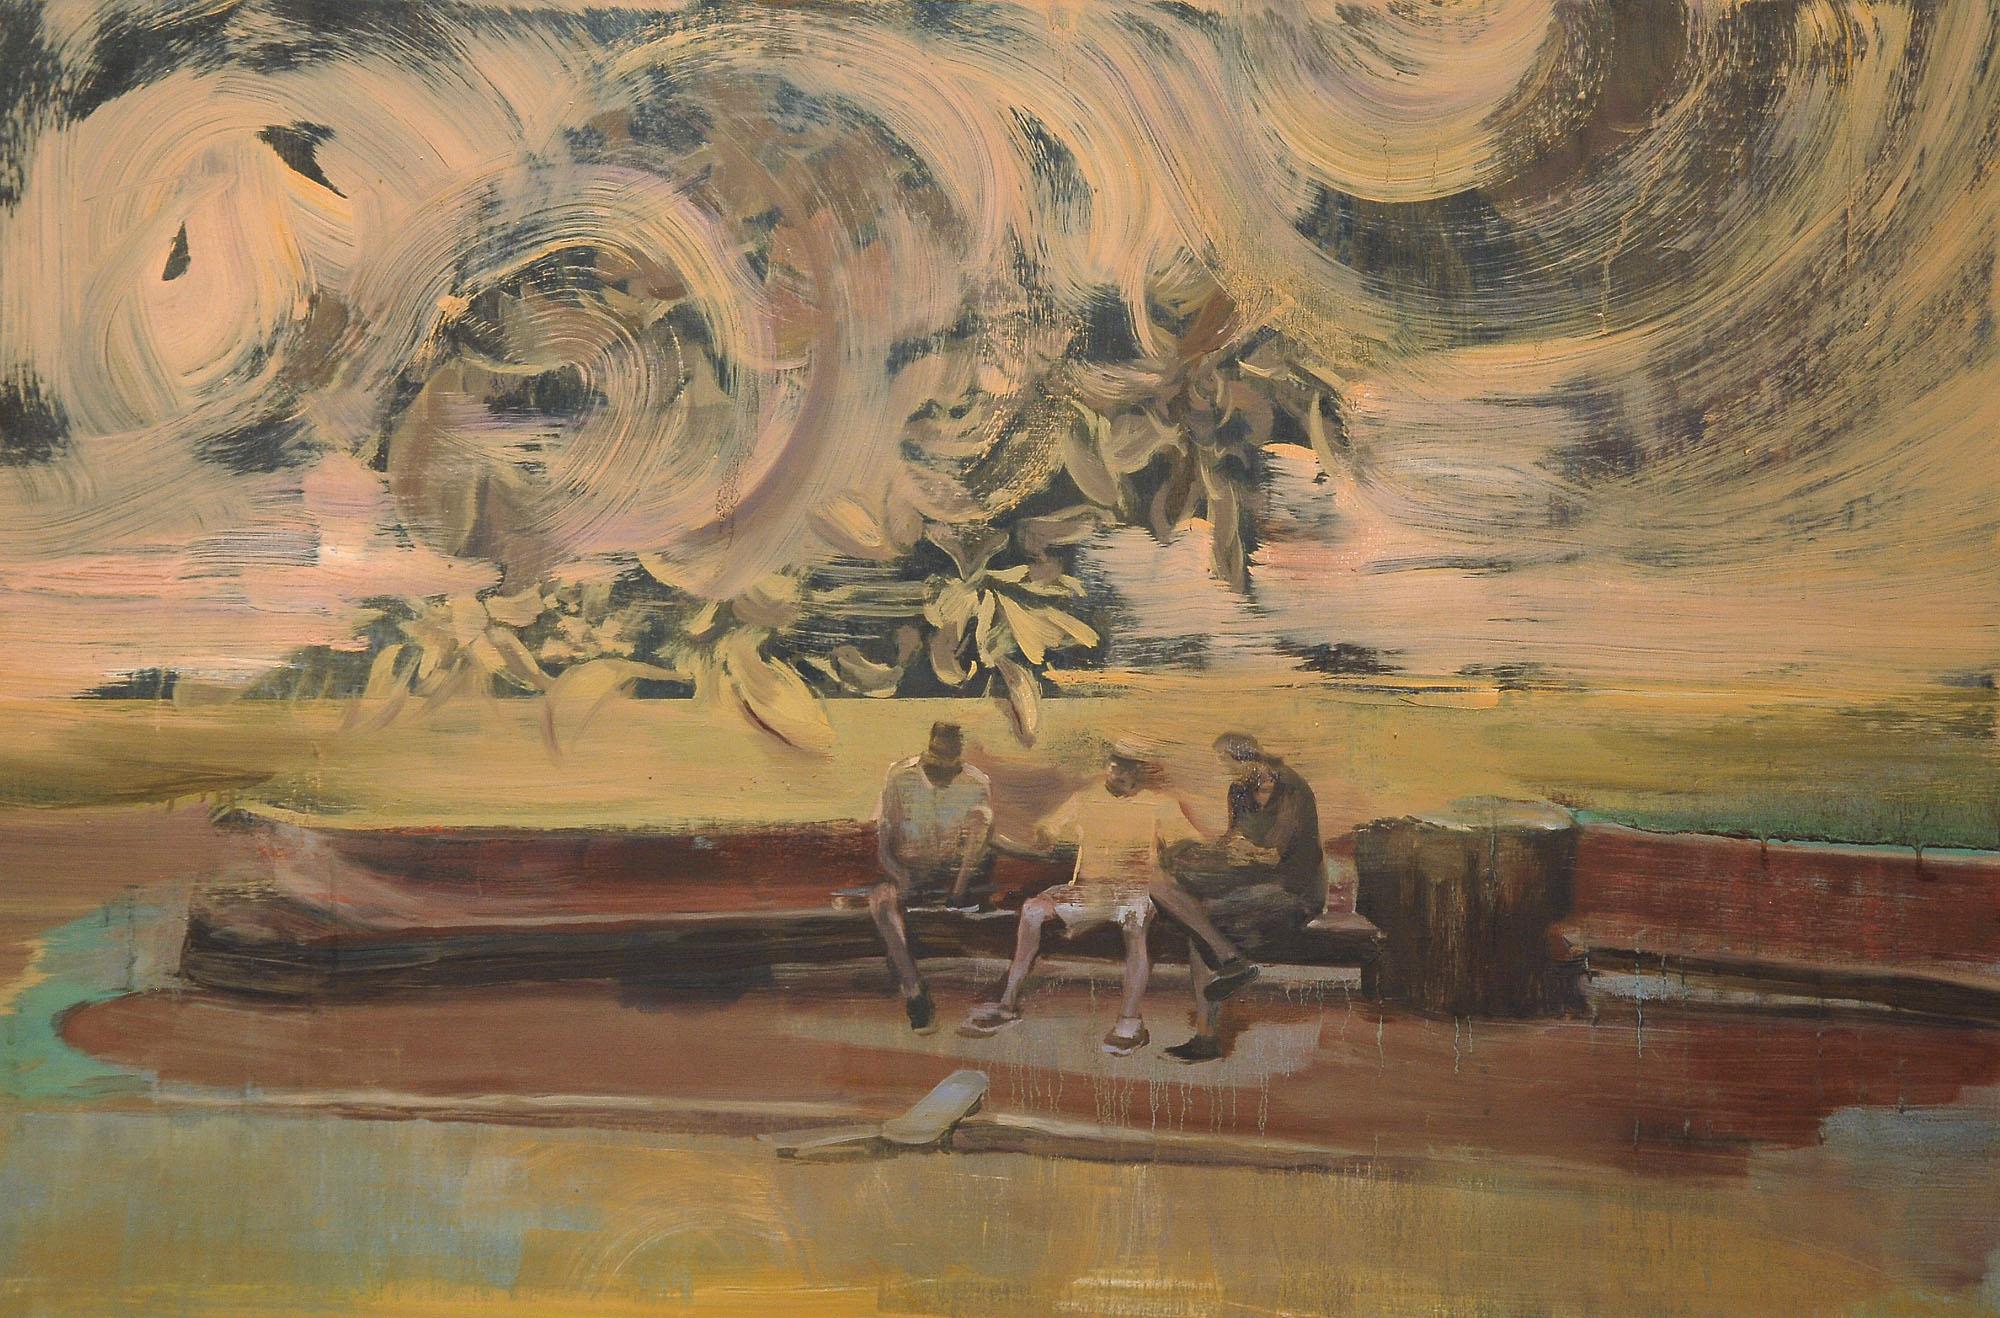 Lu Song 吕松, Dogtown z-boys 狗镇少年, 2014, Oil on canvas 布面油画, 100 x 150 cm